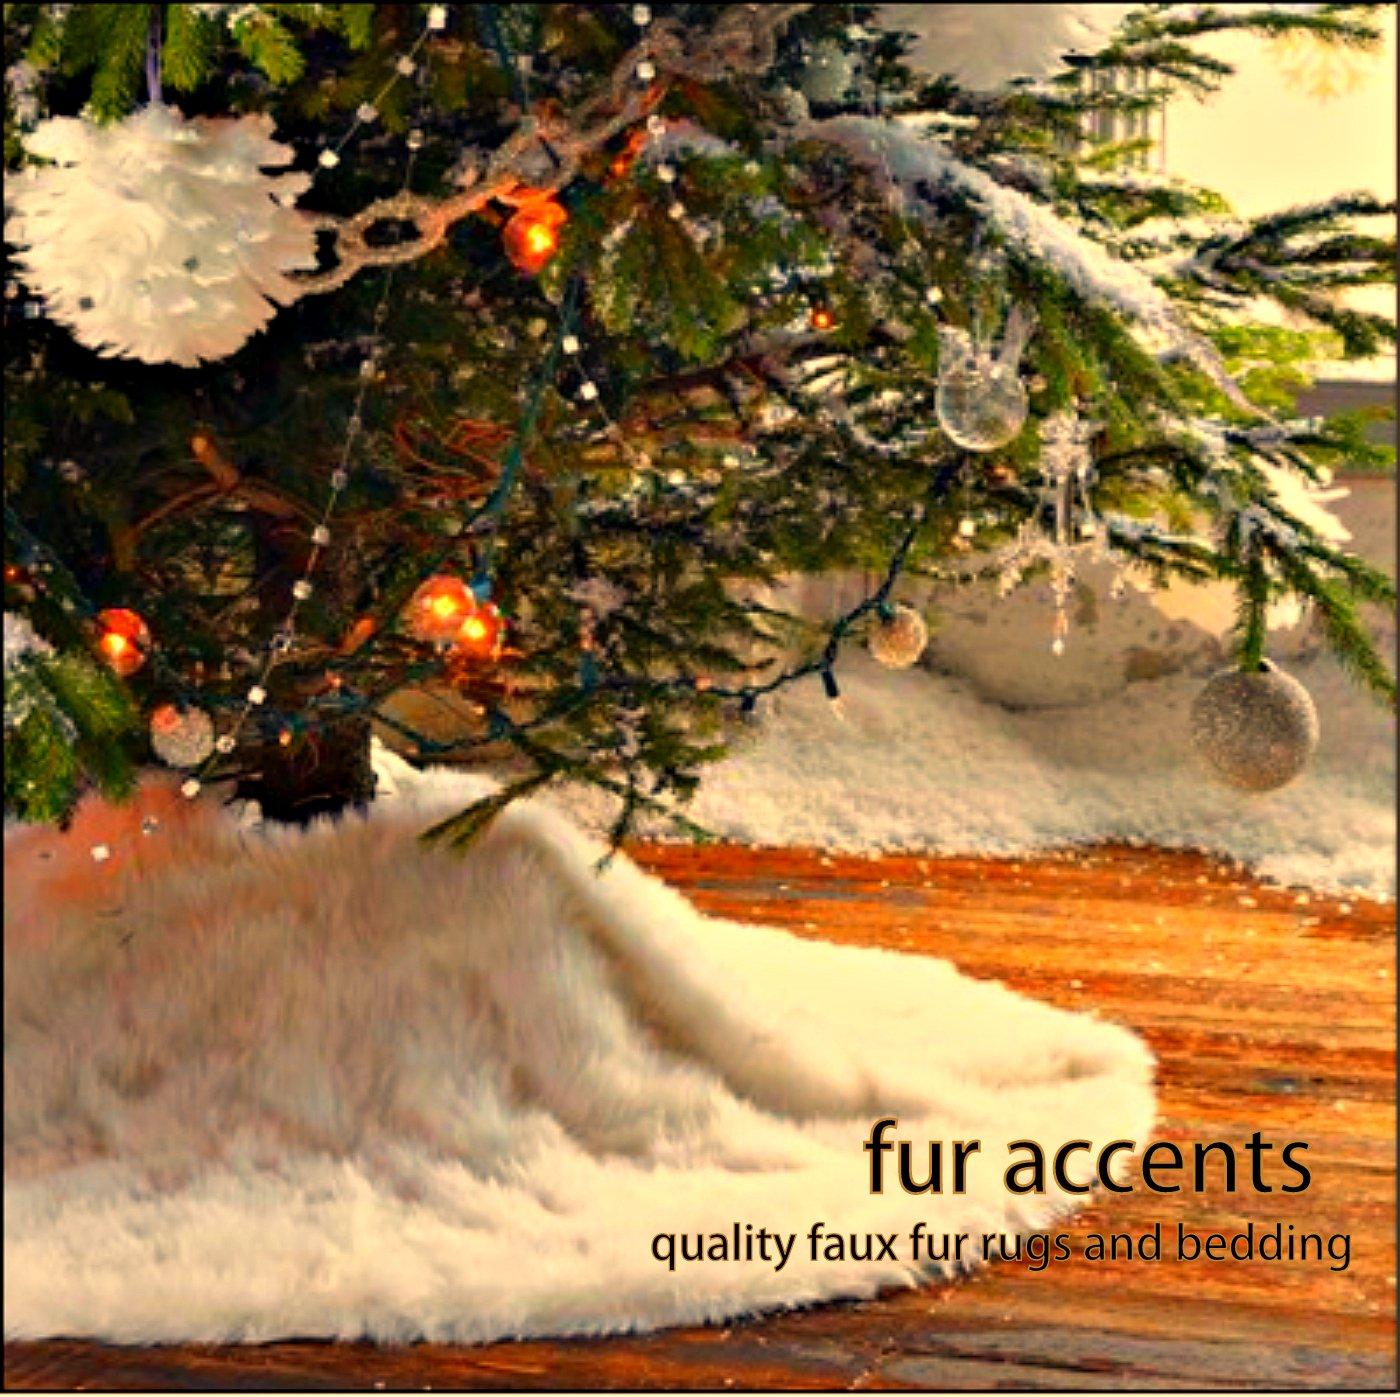 Amazon.com: Fur Accents Christmas Holiday Tree Skirt, Plush Shaggy ...